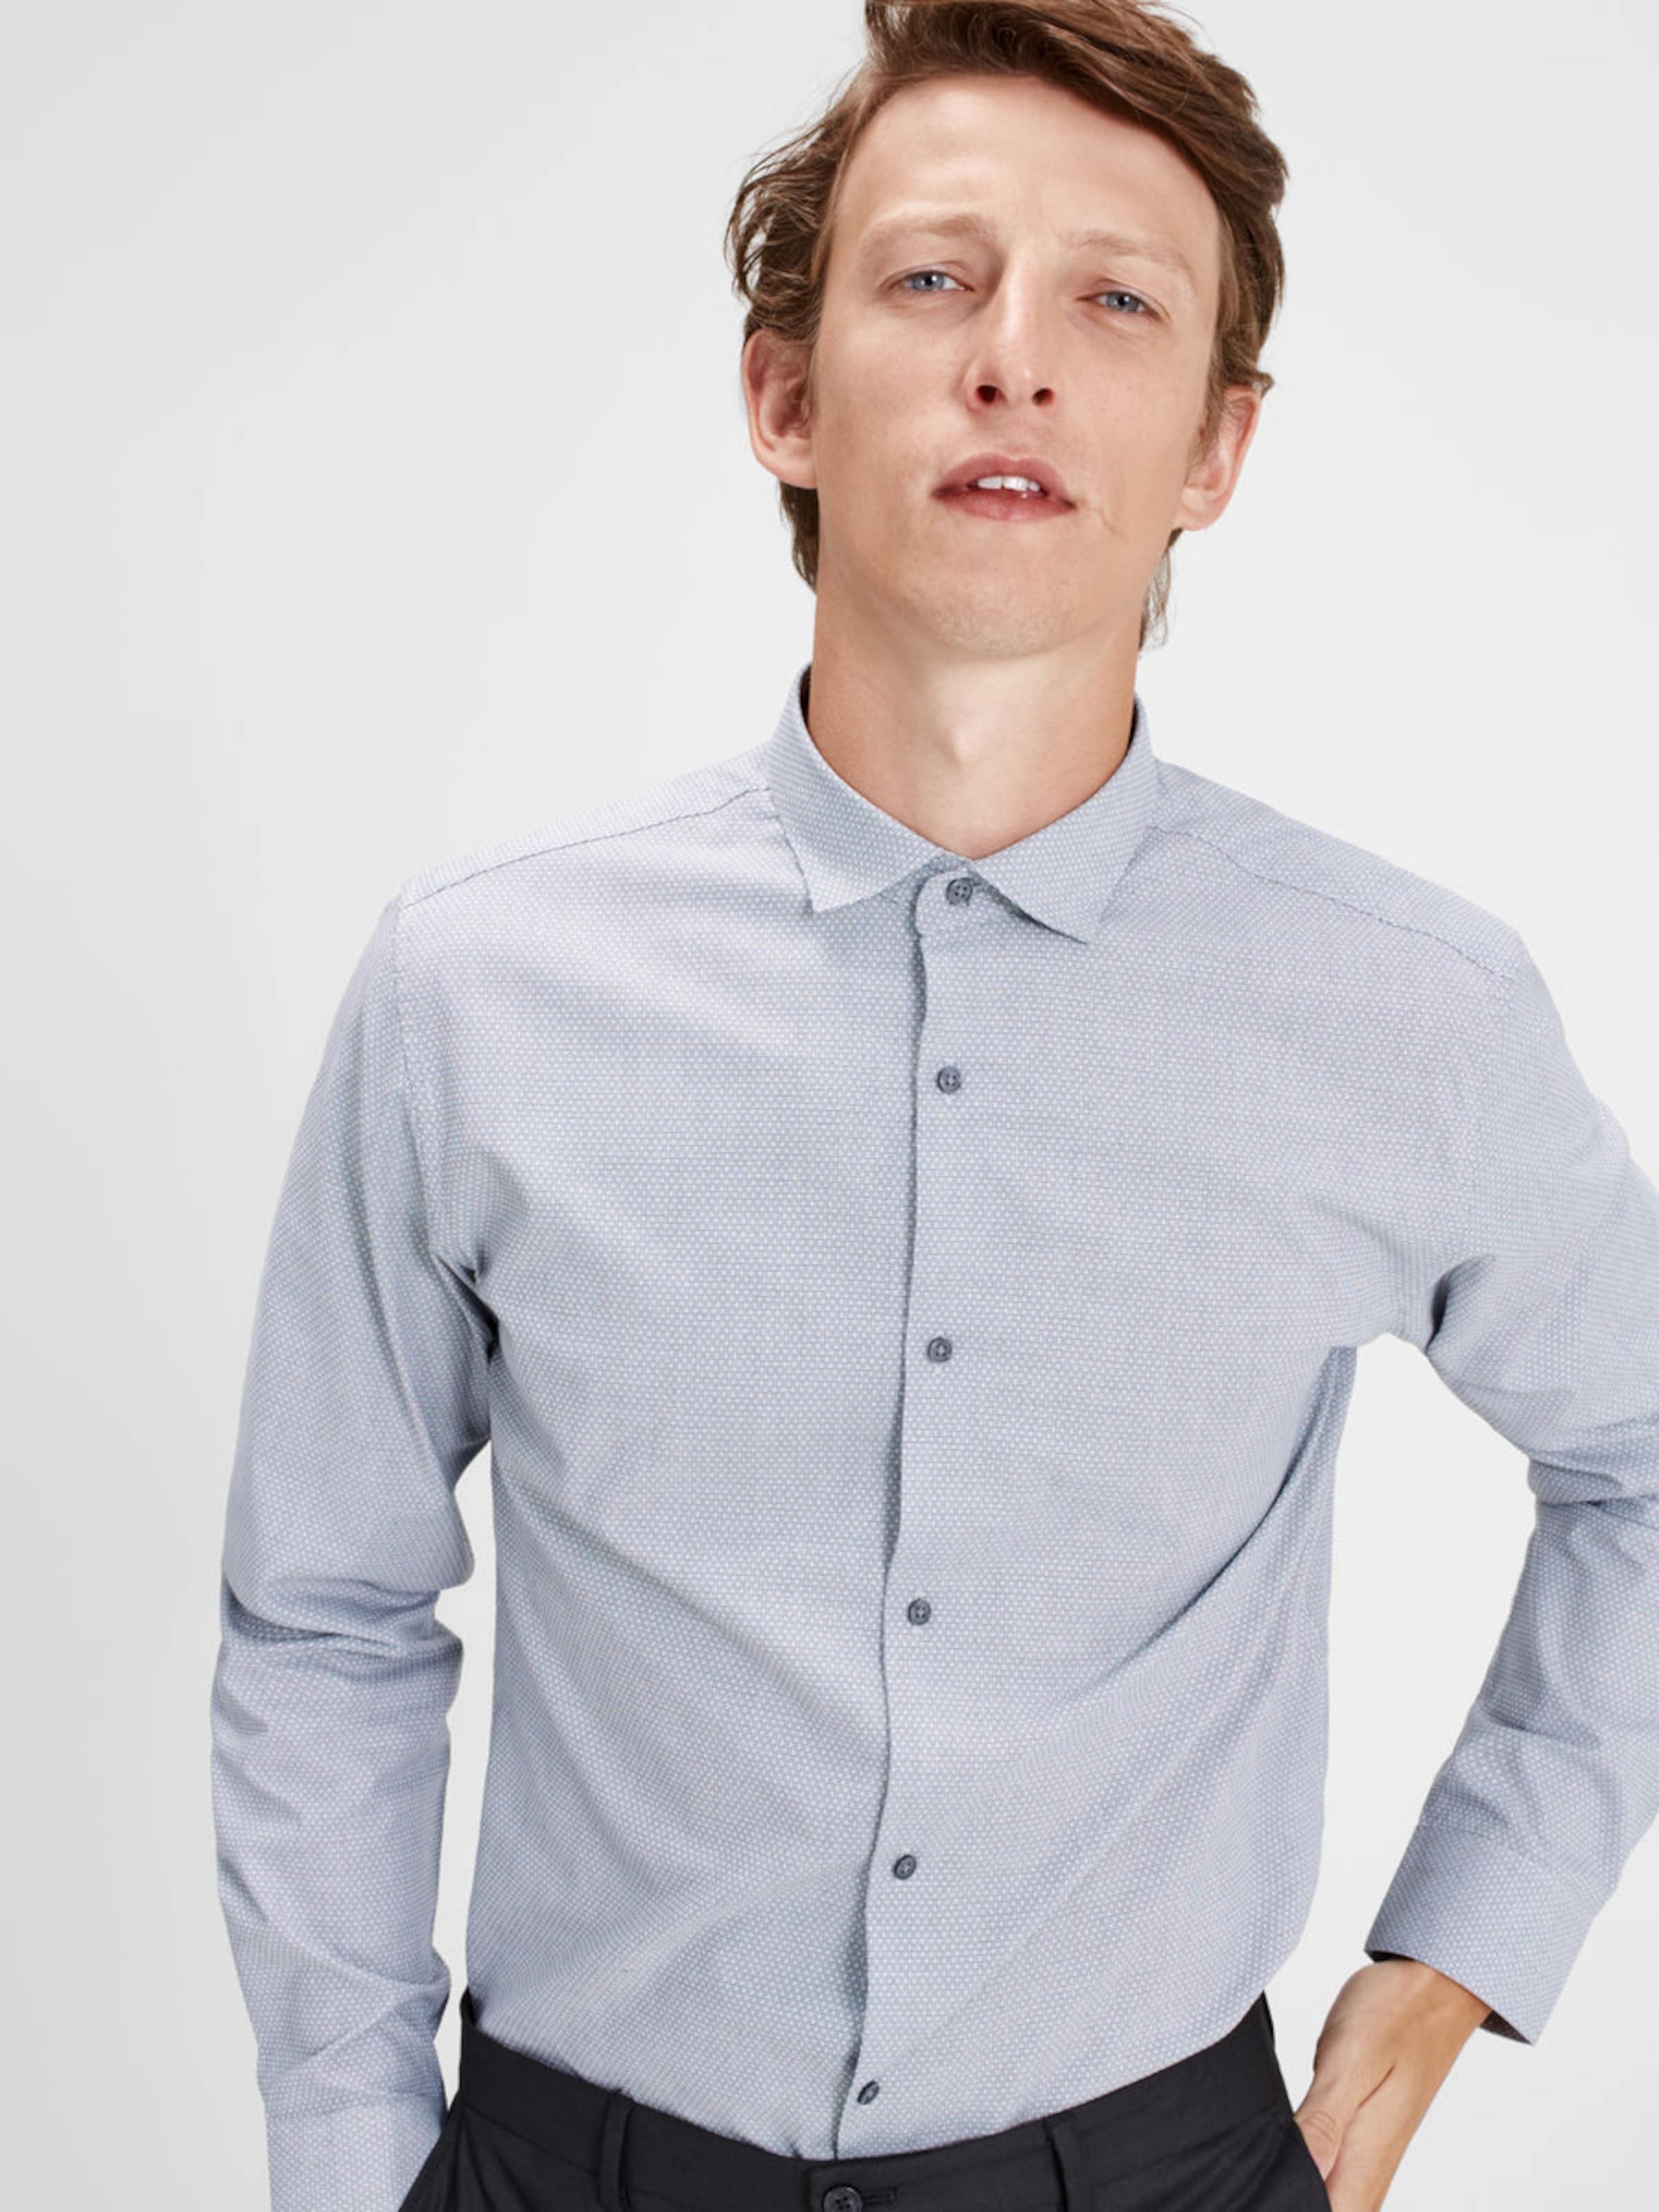 JACK & JONES Kentkragen-Langarmhemd Verkauf 2018 BCa0yaQ0wL